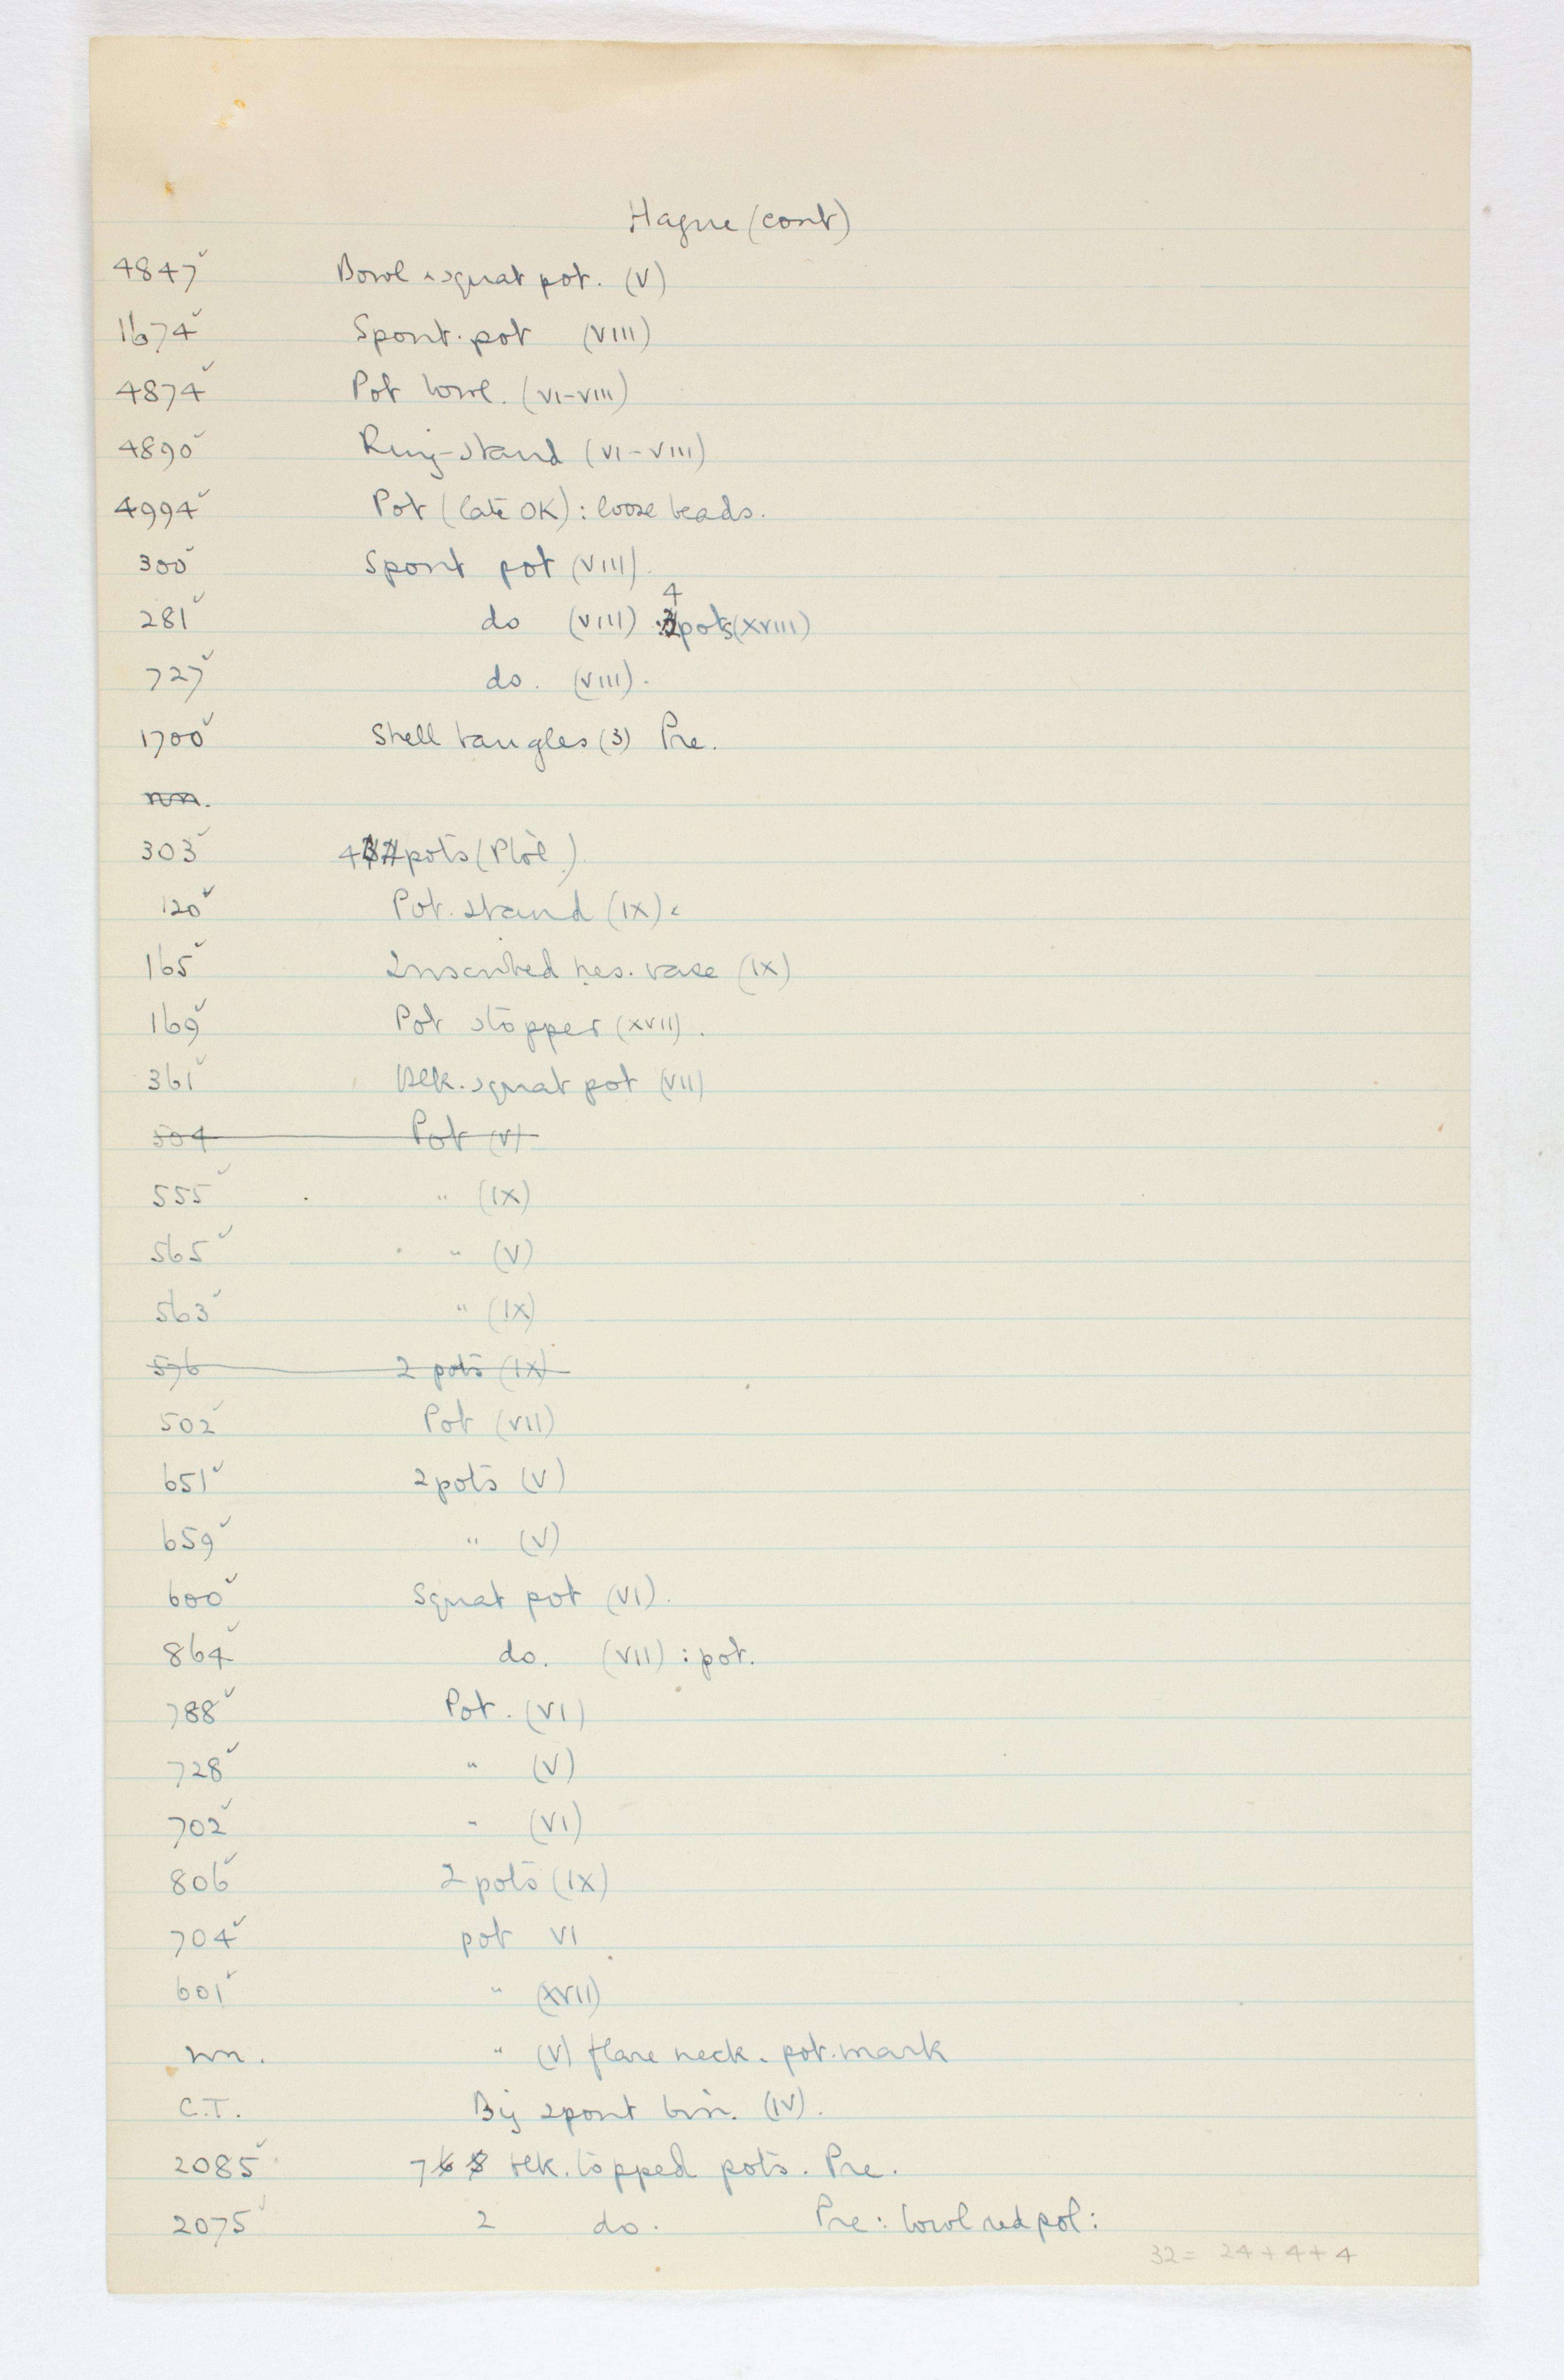 1923-24 Qau el-Kebir, Hemamieh Individual institution list PMA/WFP1/D/27/12.2